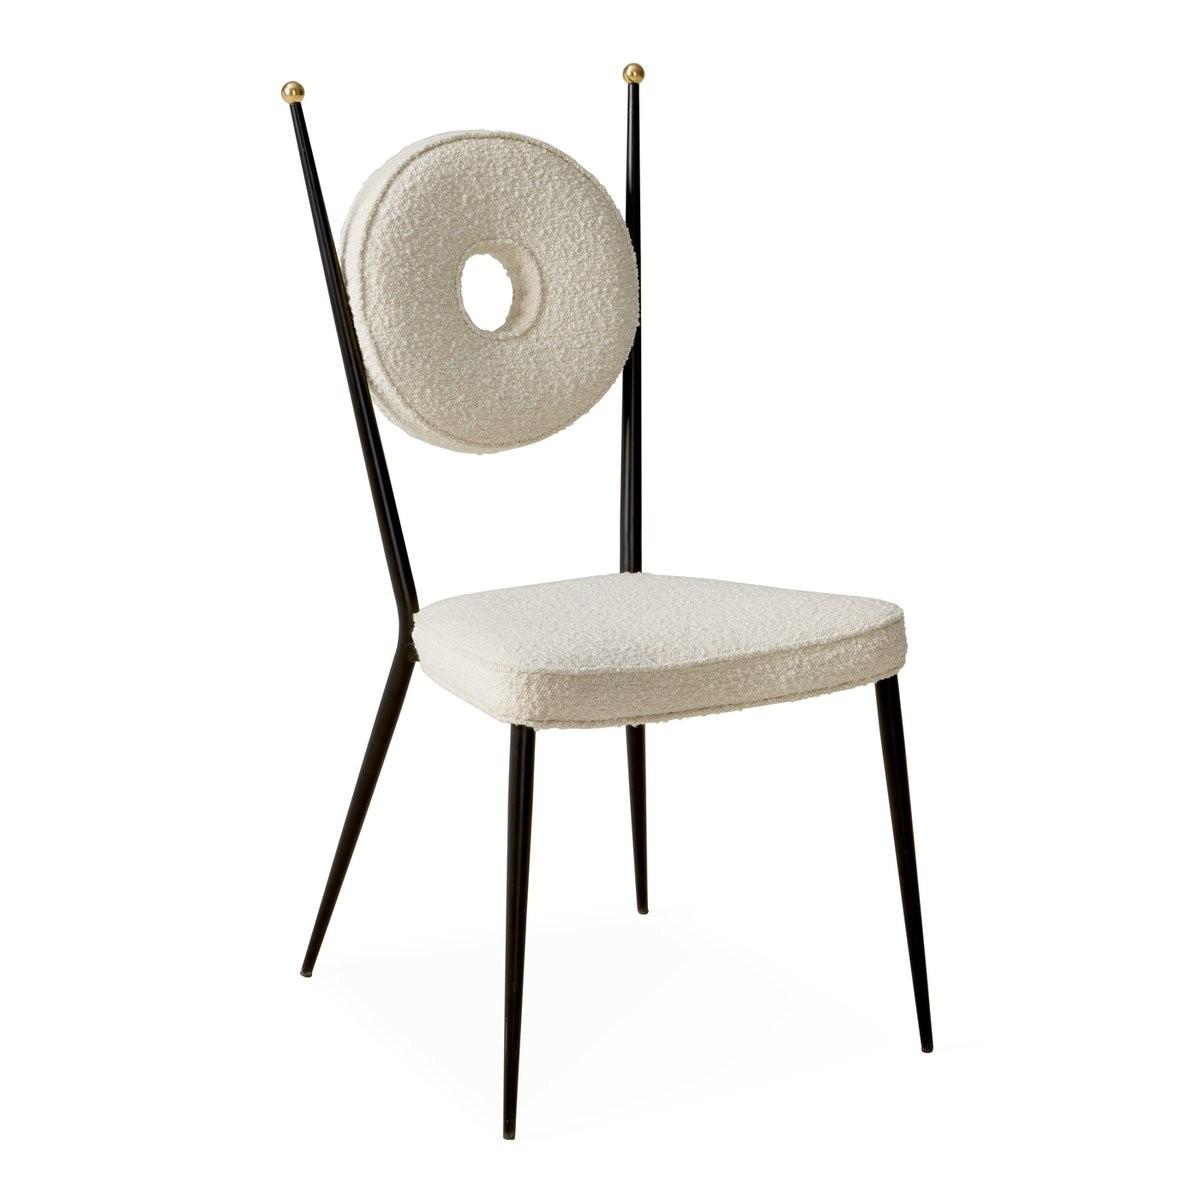 Jonathan Adler I Rondo Dining Chair